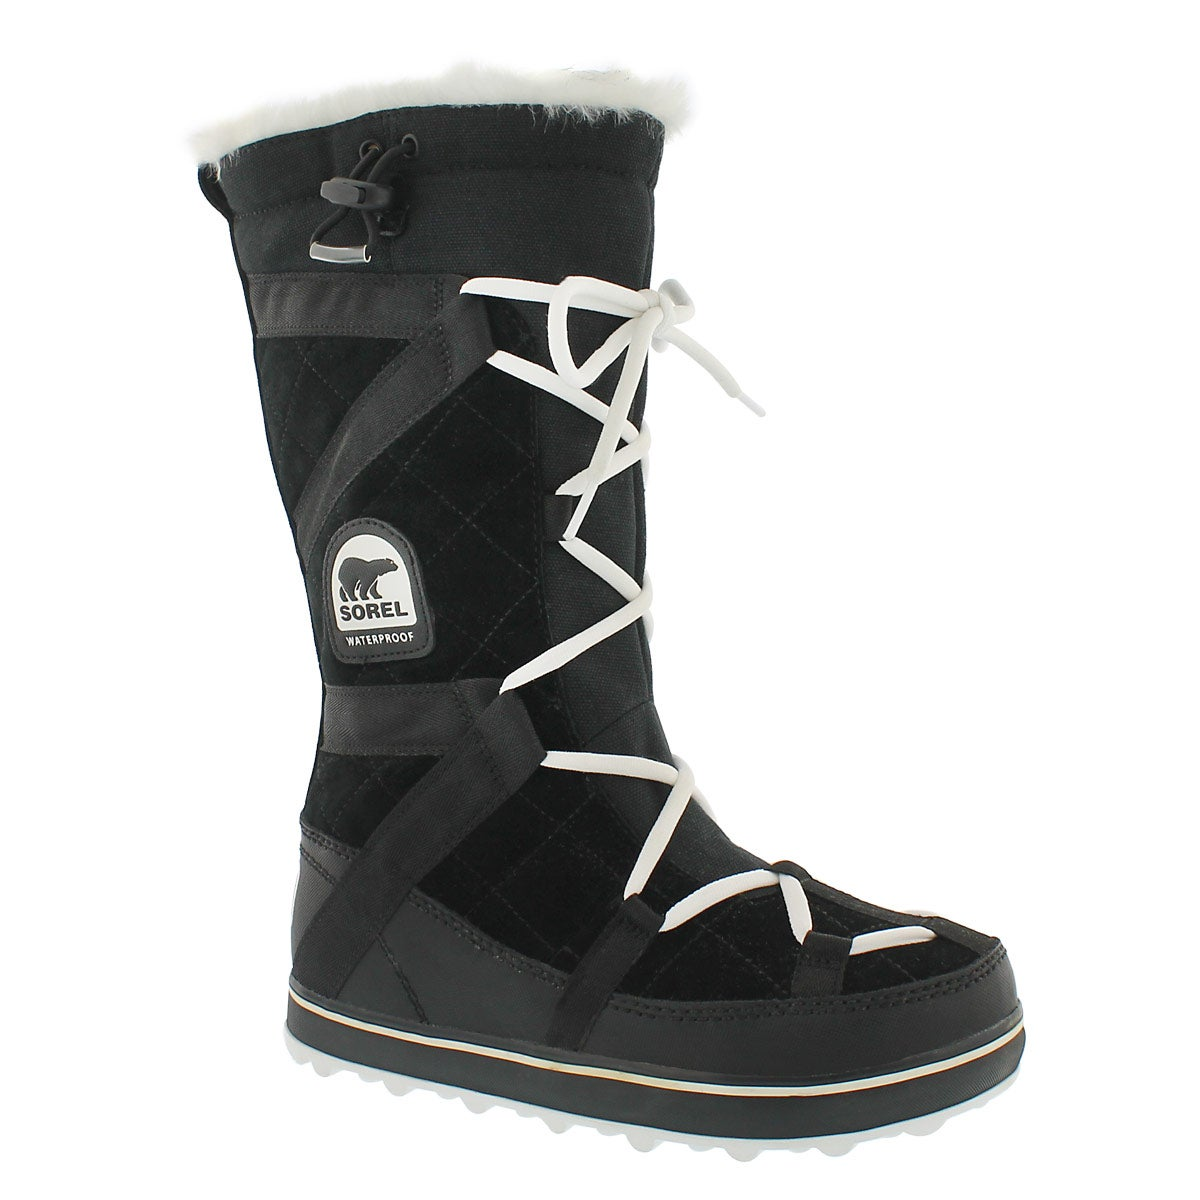 Women's GLACY EXPLORER black winter boots